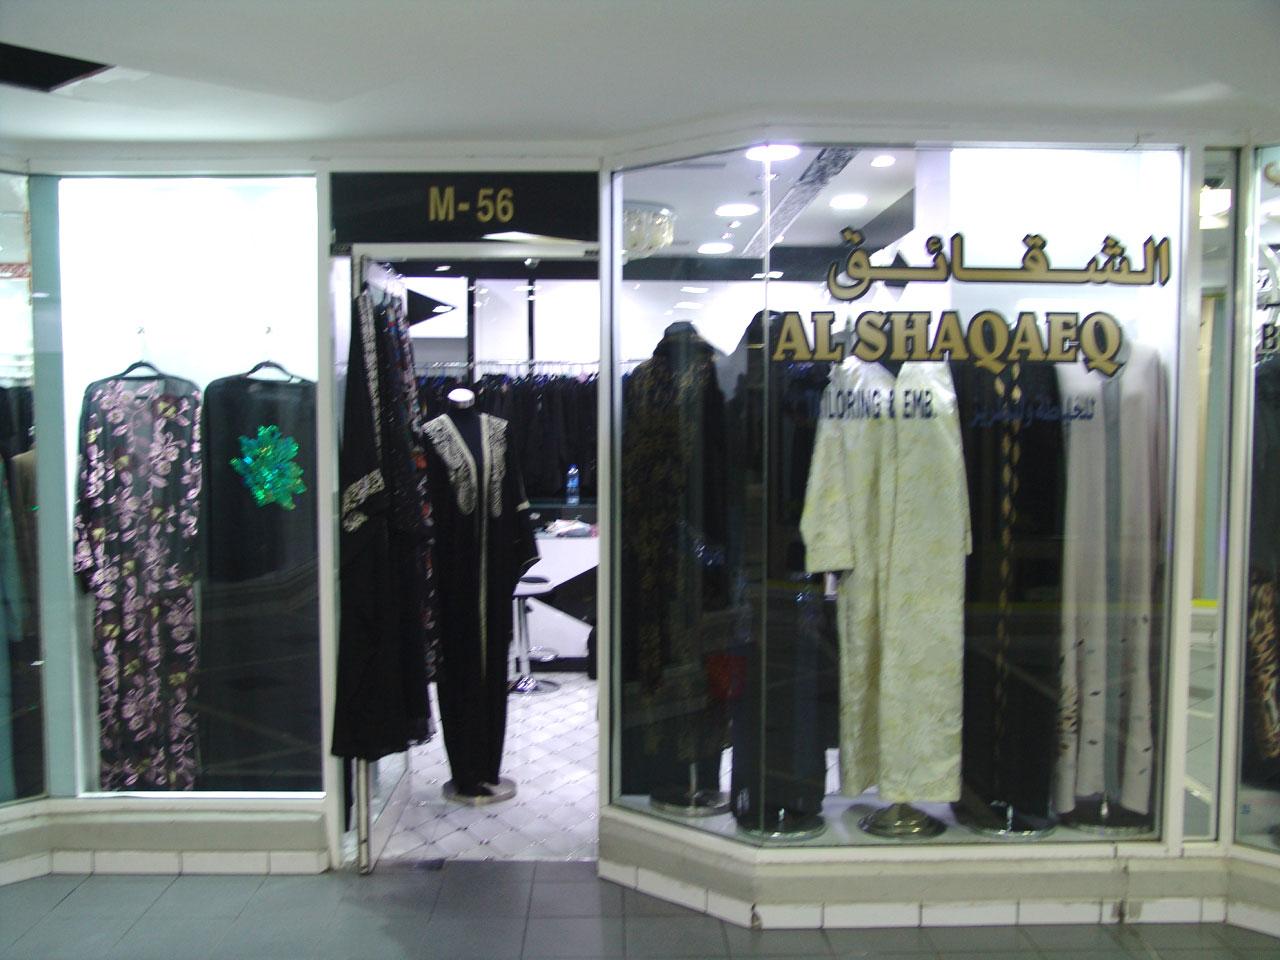 Al Shaqaeq Abaya & Sheila - DSC02599.jpg